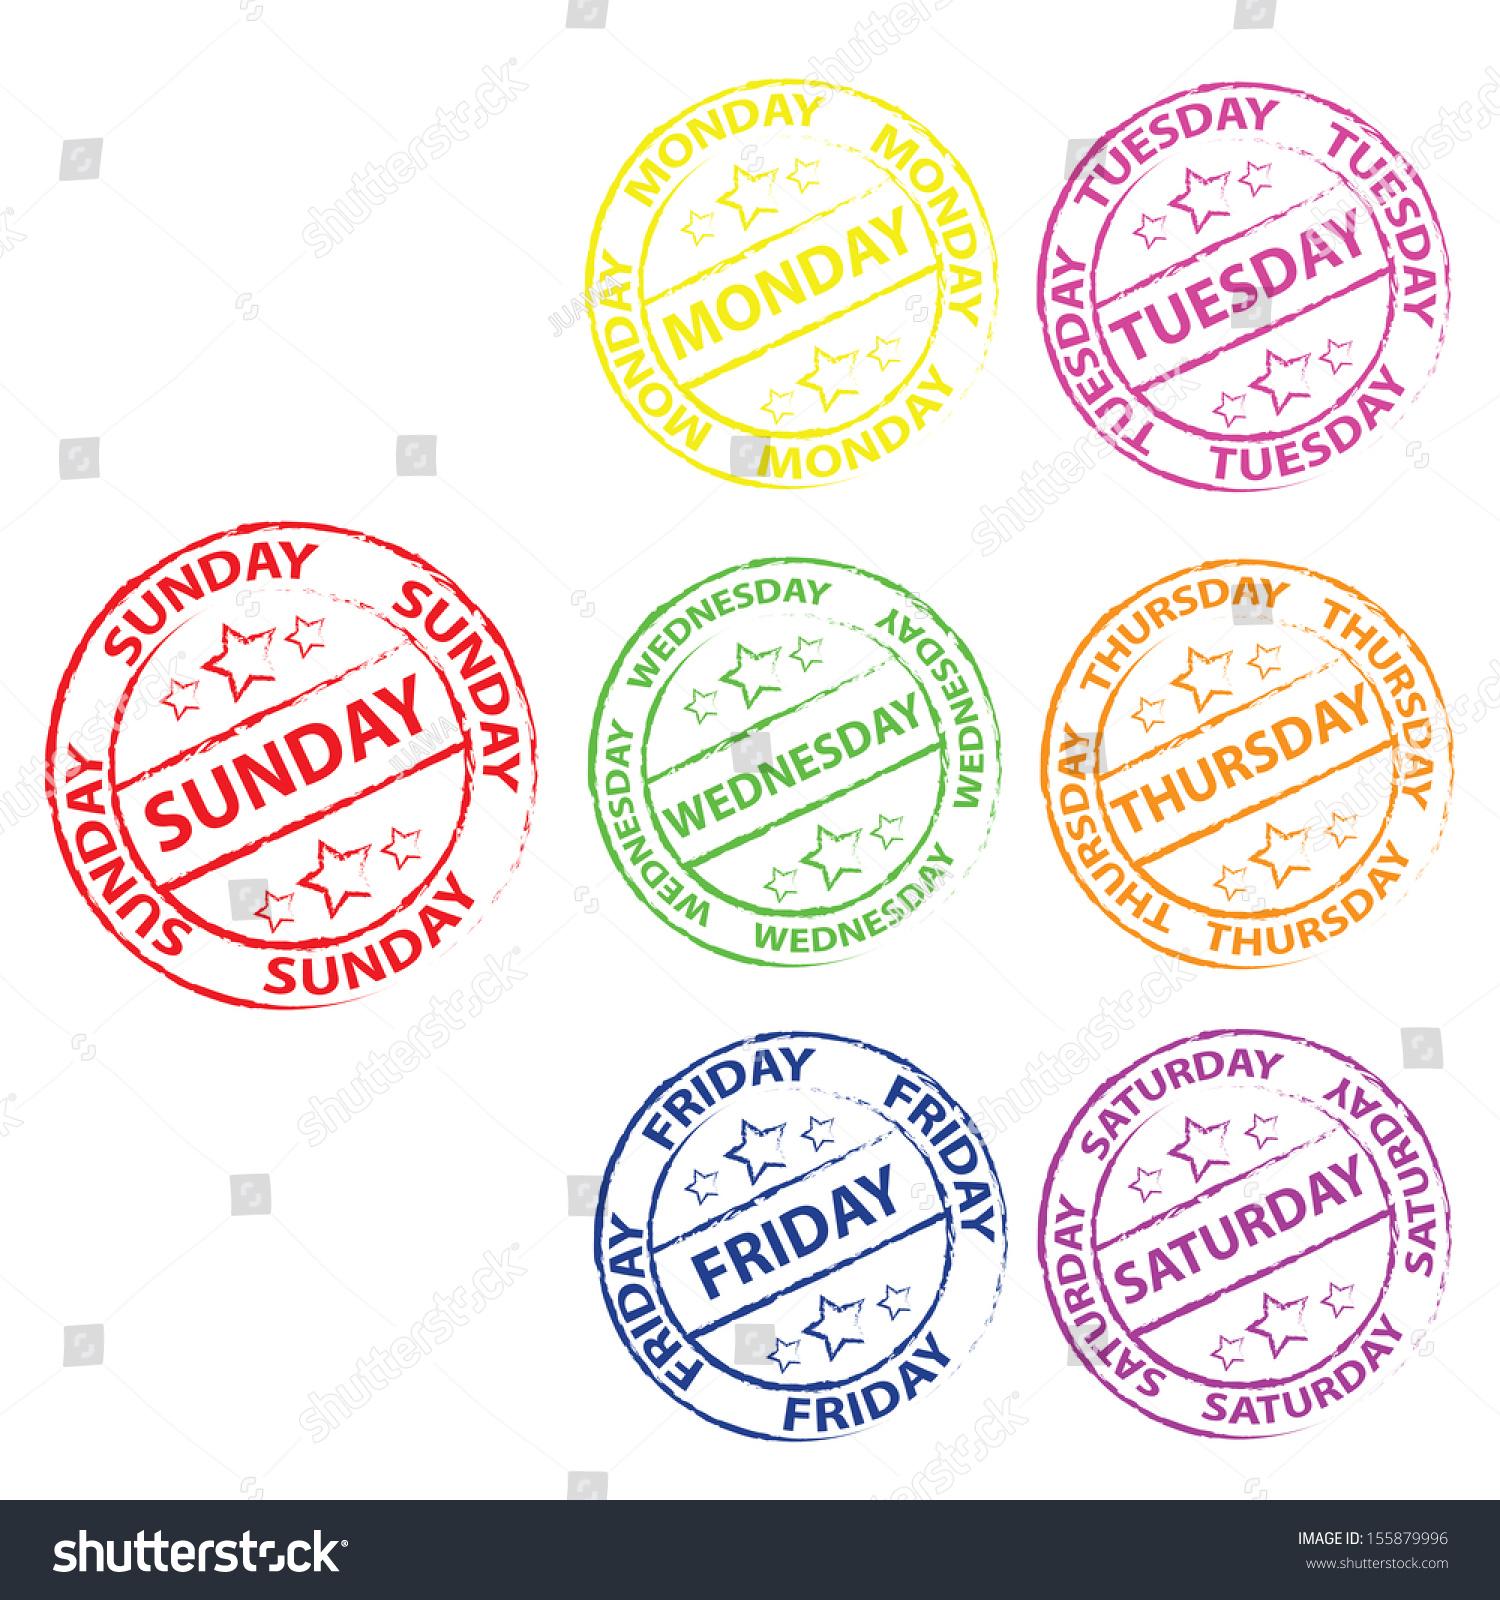 Seven Colorful Calendar Stamps Days Week Stock Illustration